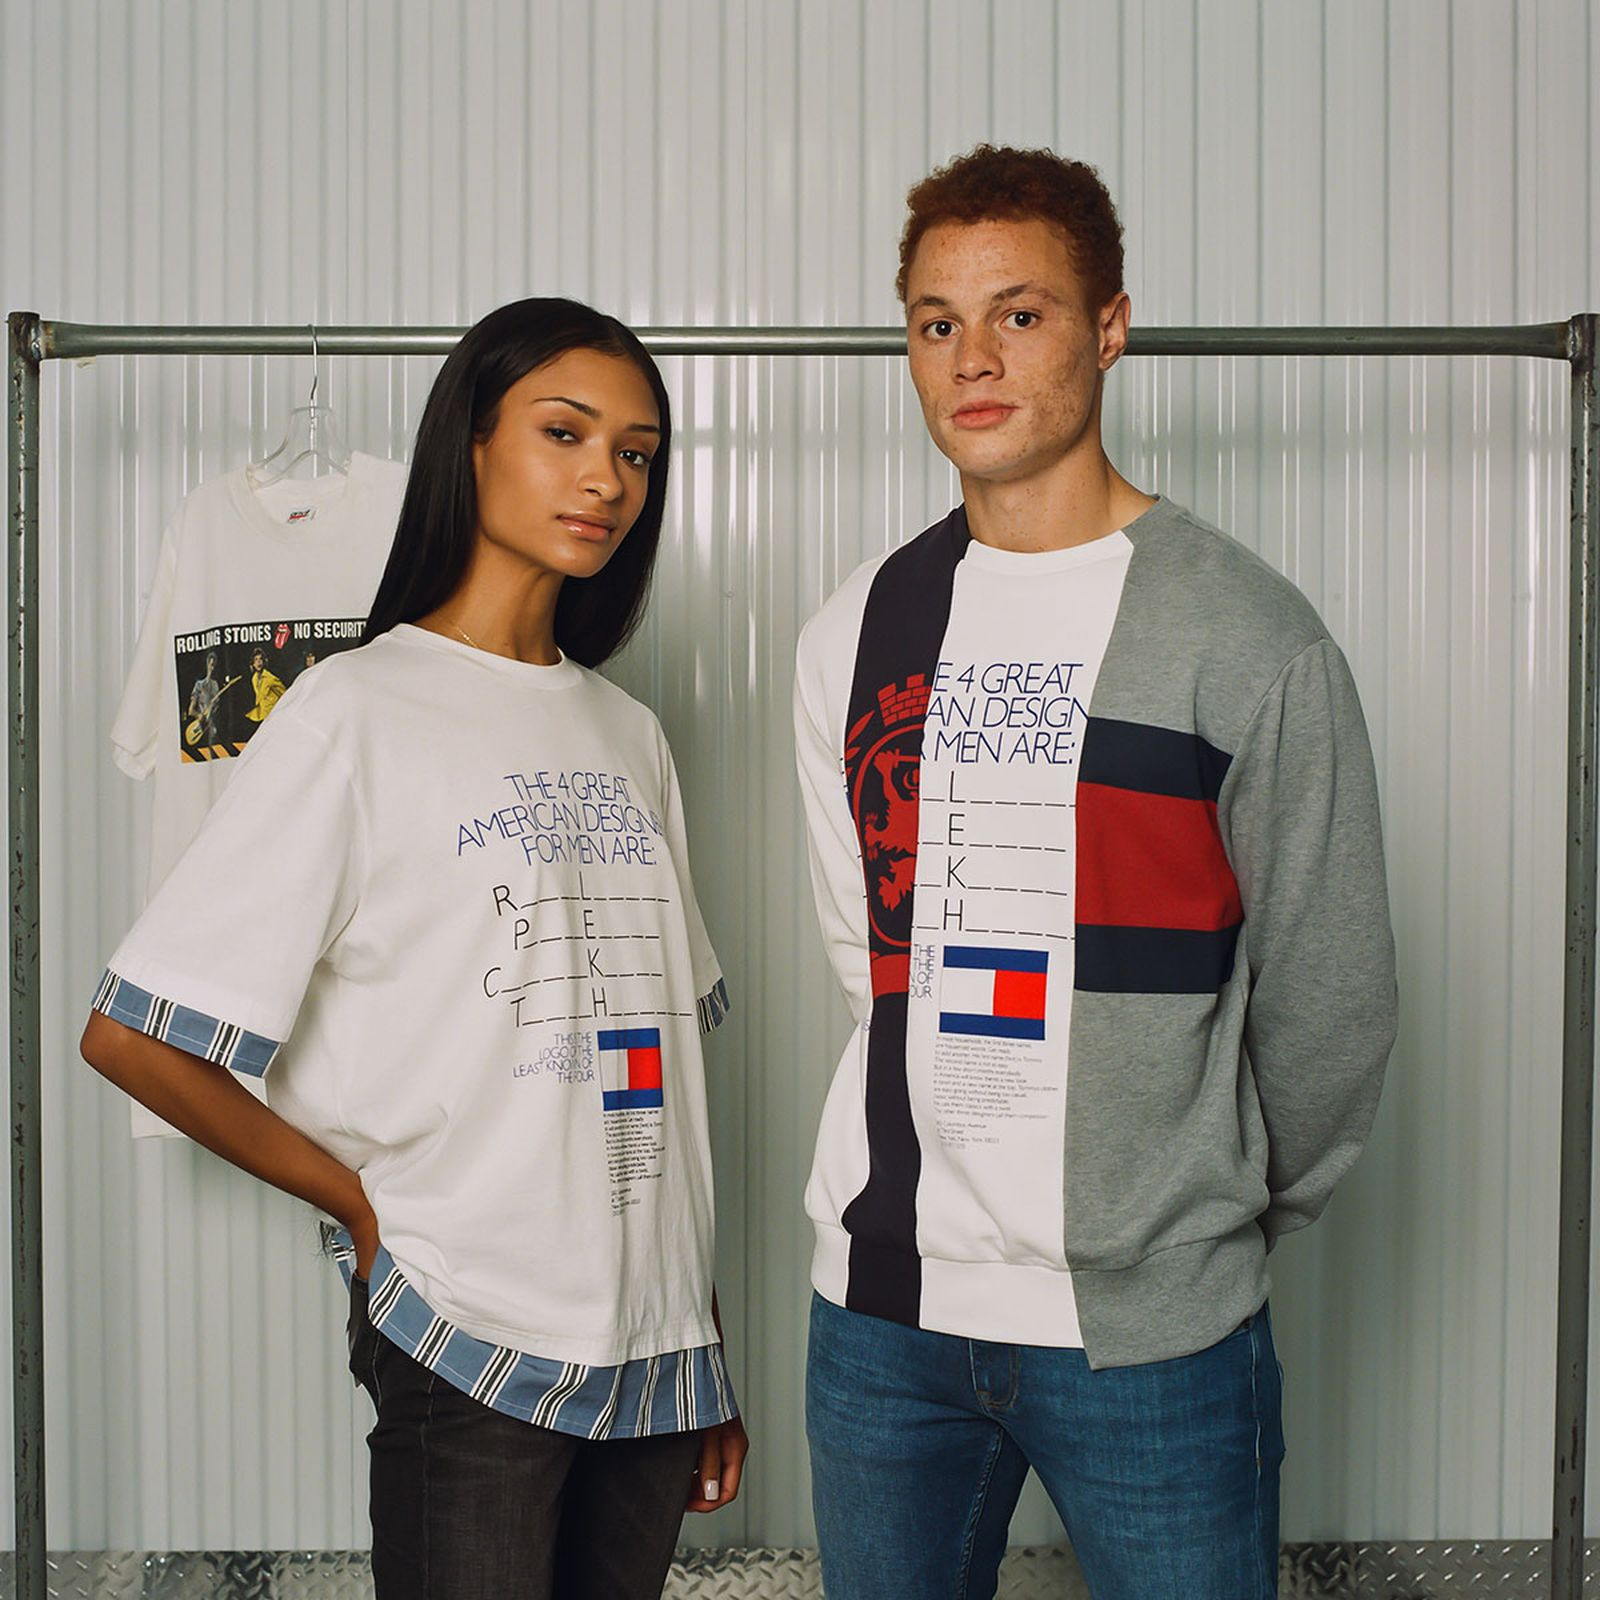 (Left) Tommy Hilfiger Collection Men's Photo Print T-Shirt (Spring 2018). (Right) Tommy Hilfiger Collection Men's Multi Logo Sweatshirt (Spring 2019)